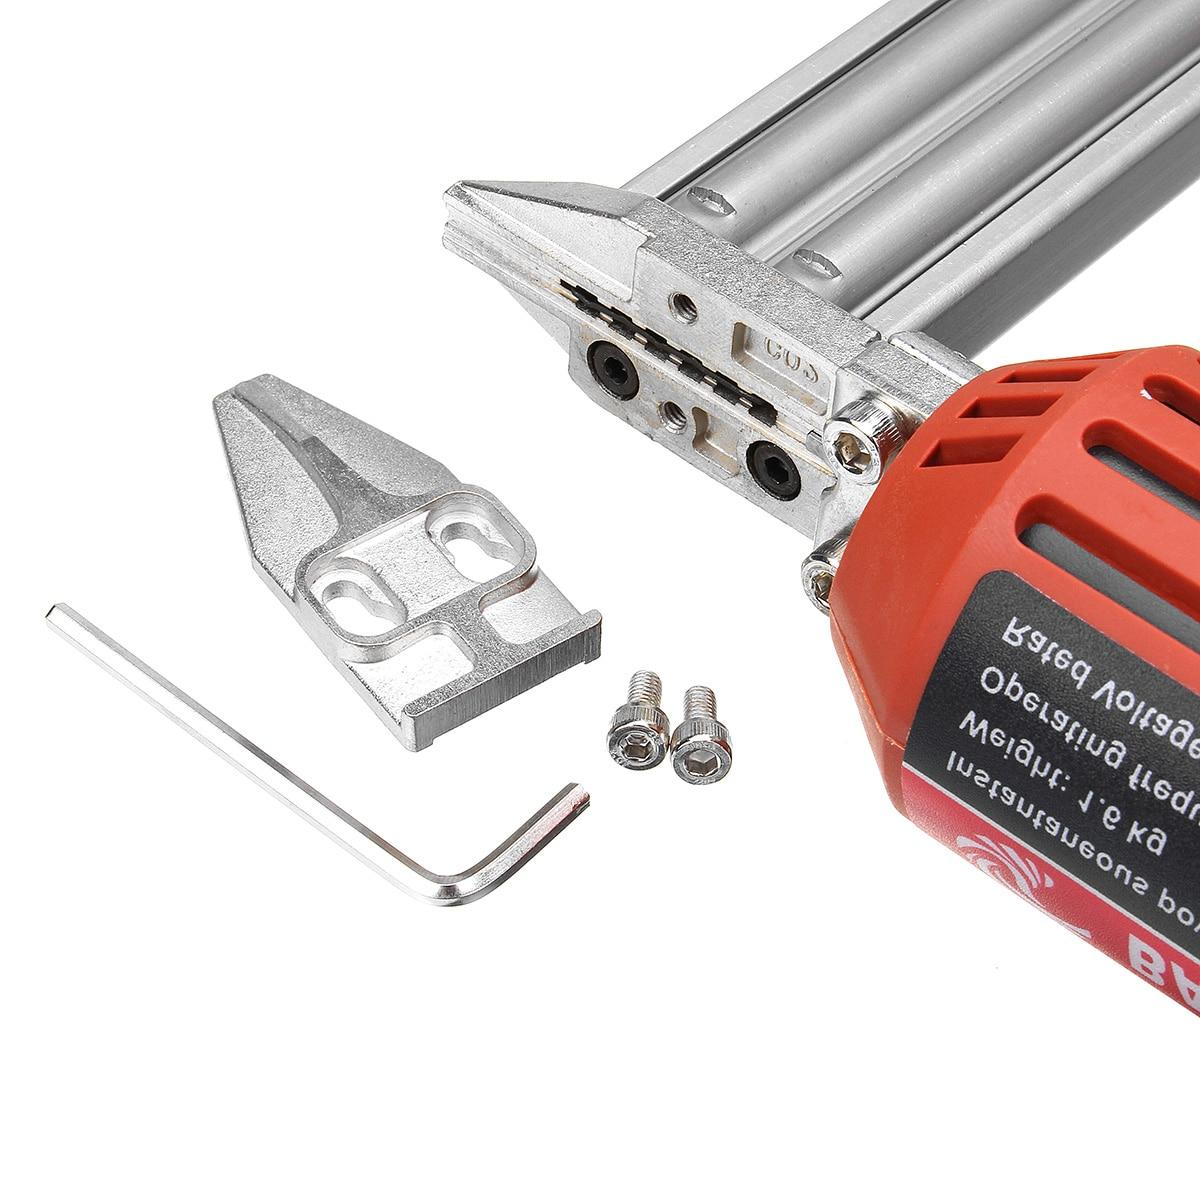 Electric <font><b>Nailer</b></font> 10-30mm 1800W Staple <font><b>Guns</b></font> Tool Weight Portable Speed Rate